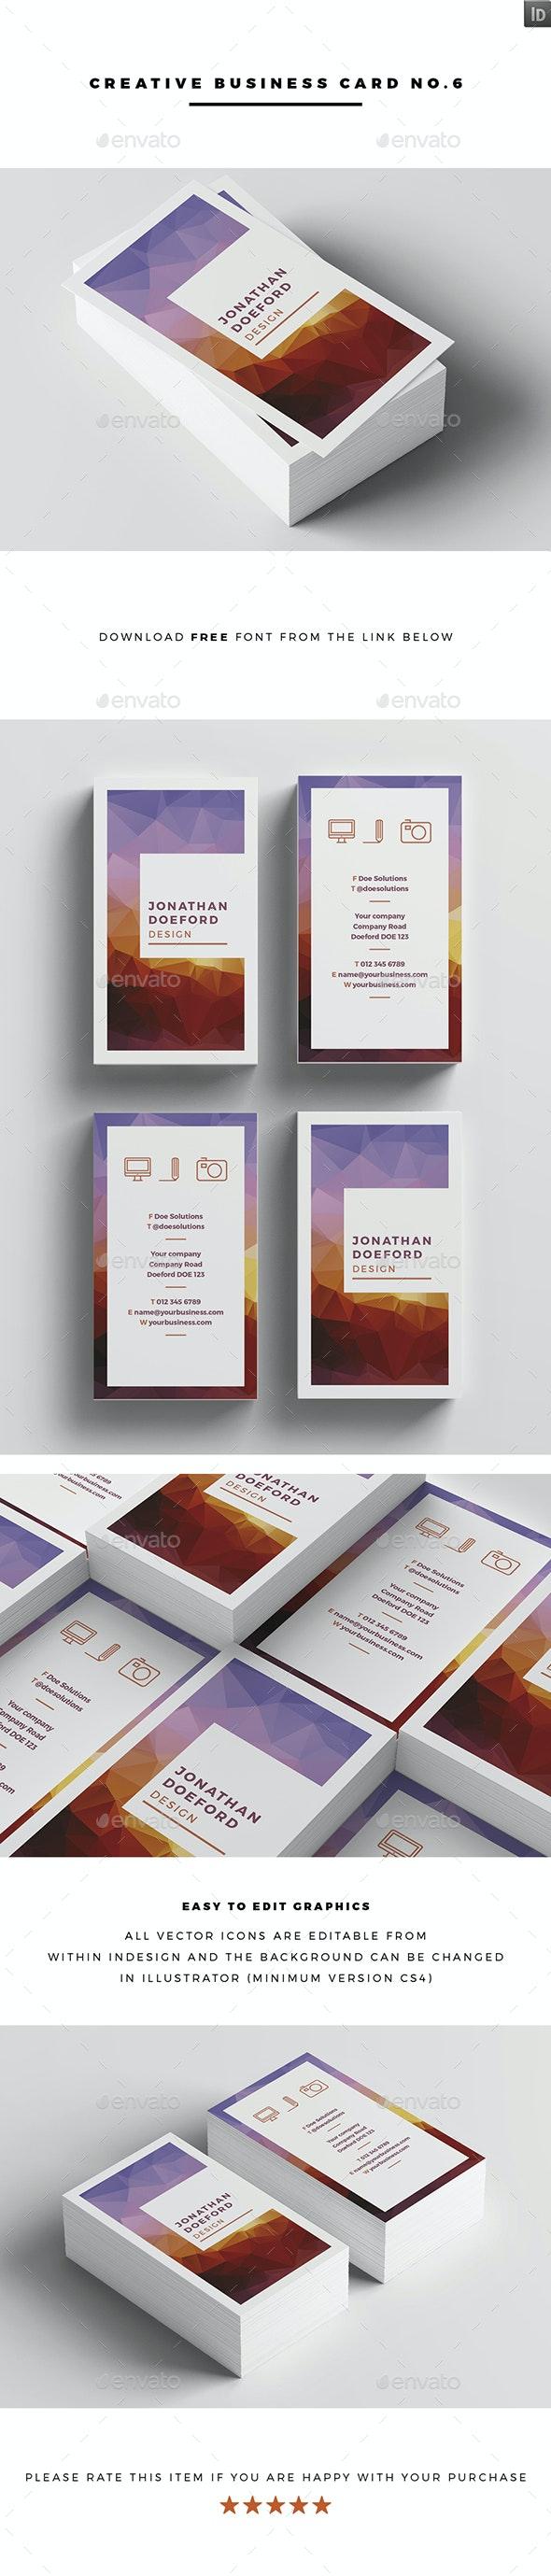 Creative Business Card No.6 - Creative Business Cards